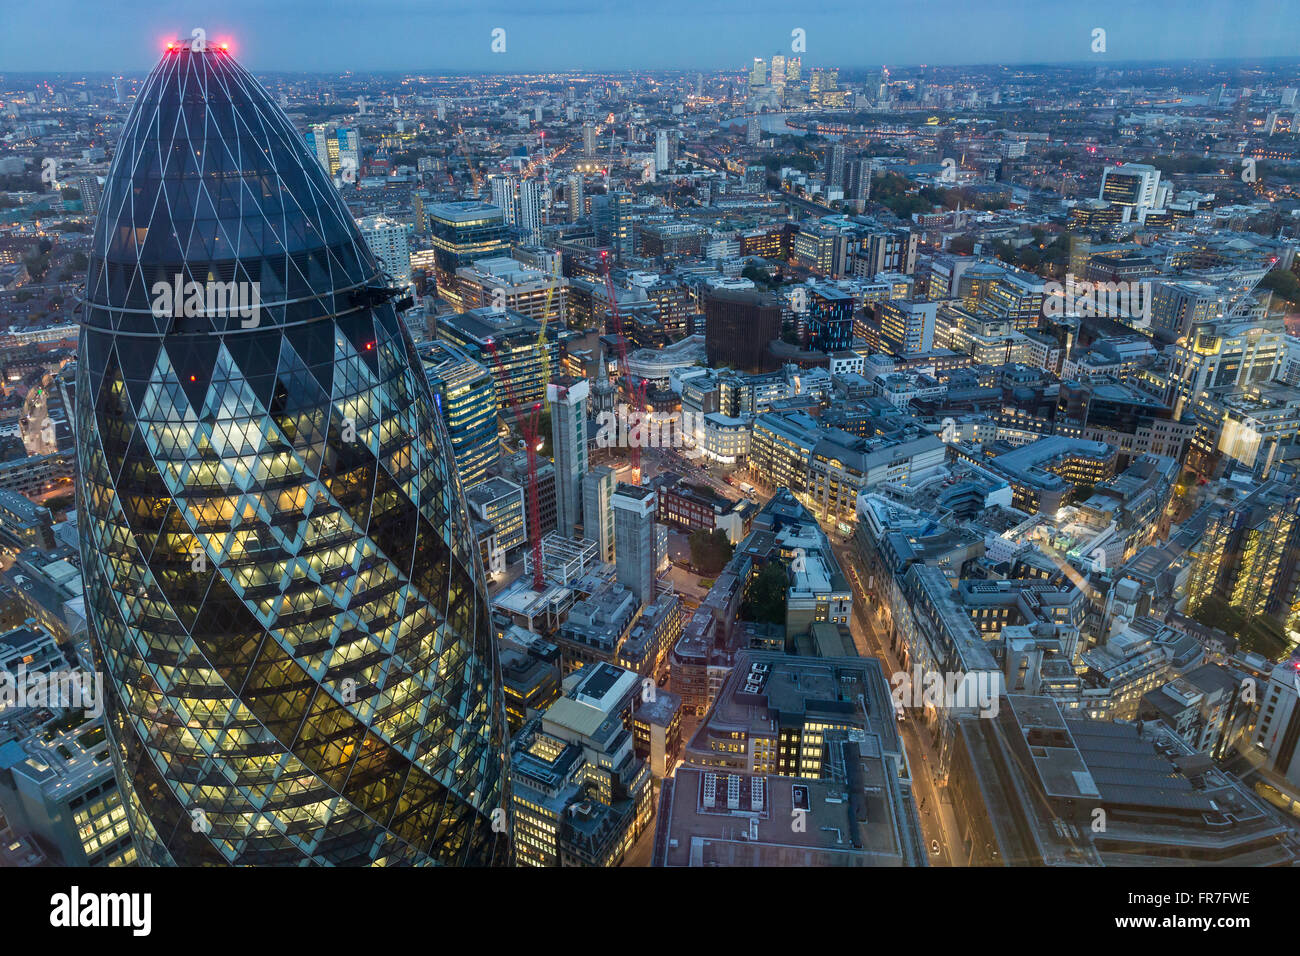 Der Londoner Skyline in der Abenddämmerung. Stockbild